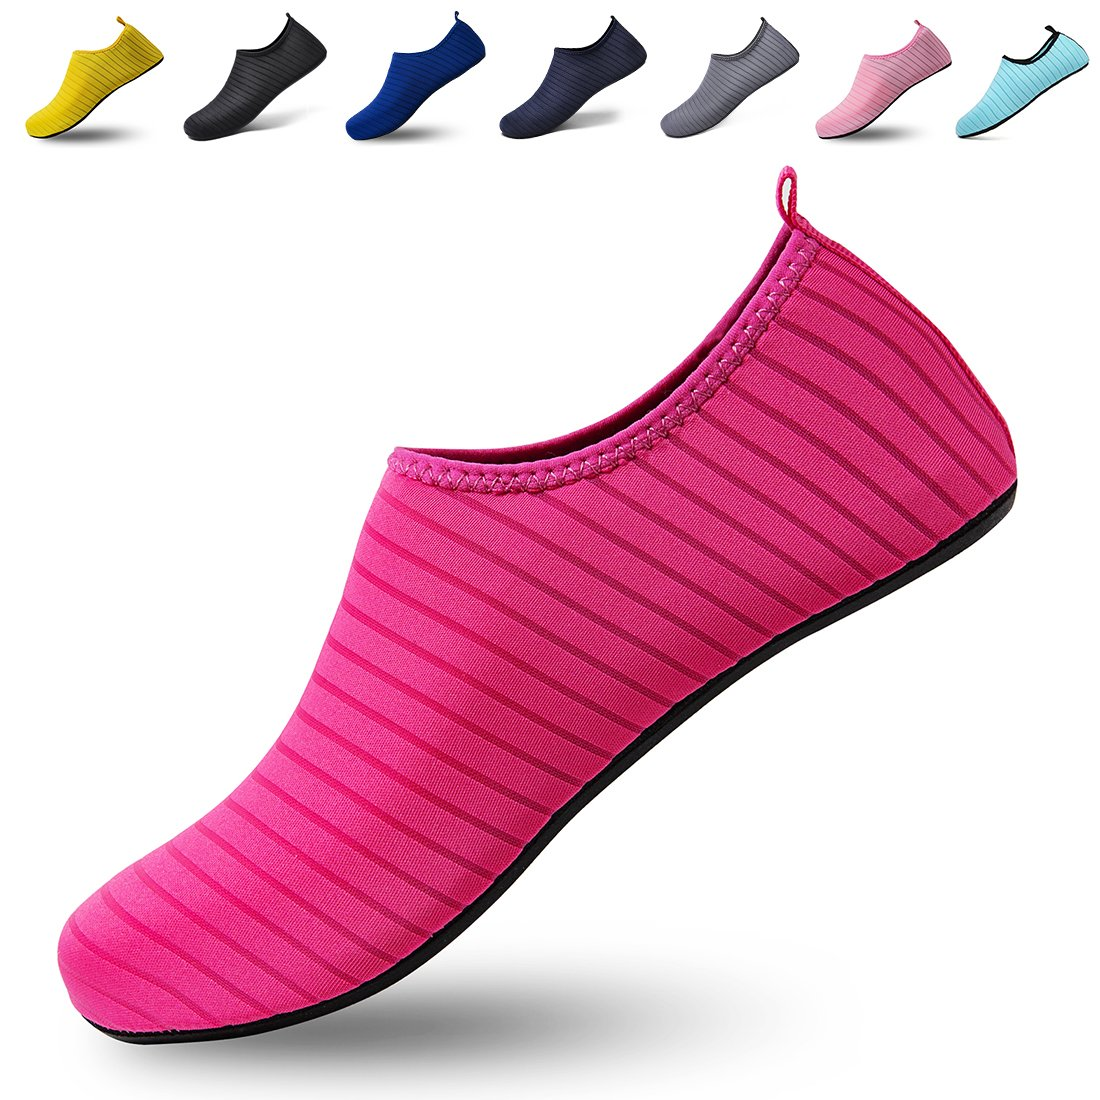 Lauwodun Unisex Water Shoes Quick Dry Barefoot Aqua Sock Men Women Beach Pool Swim Surf Yoga Exercise